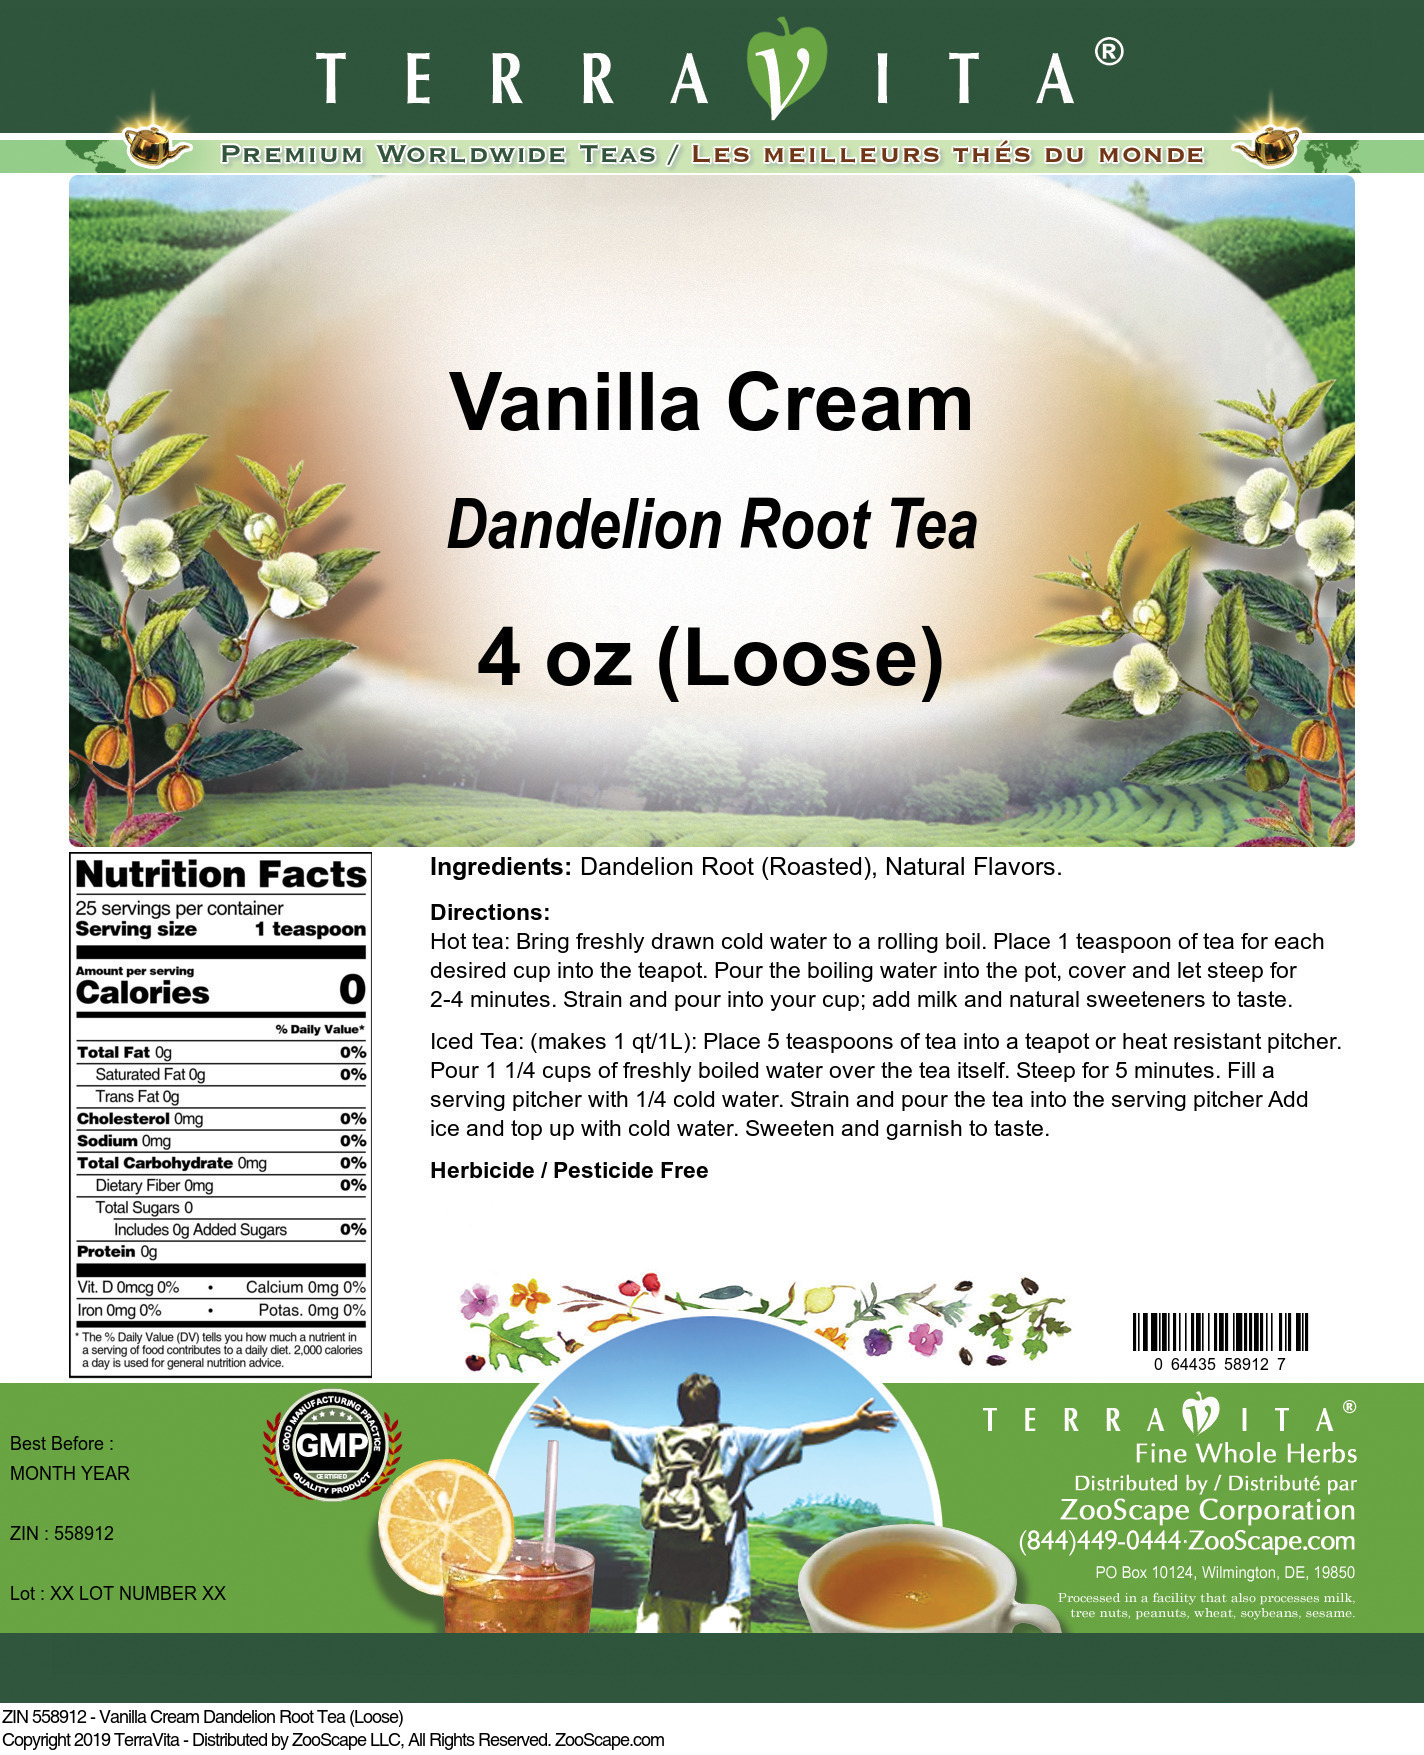 Vanilla Cream Dandelion Root